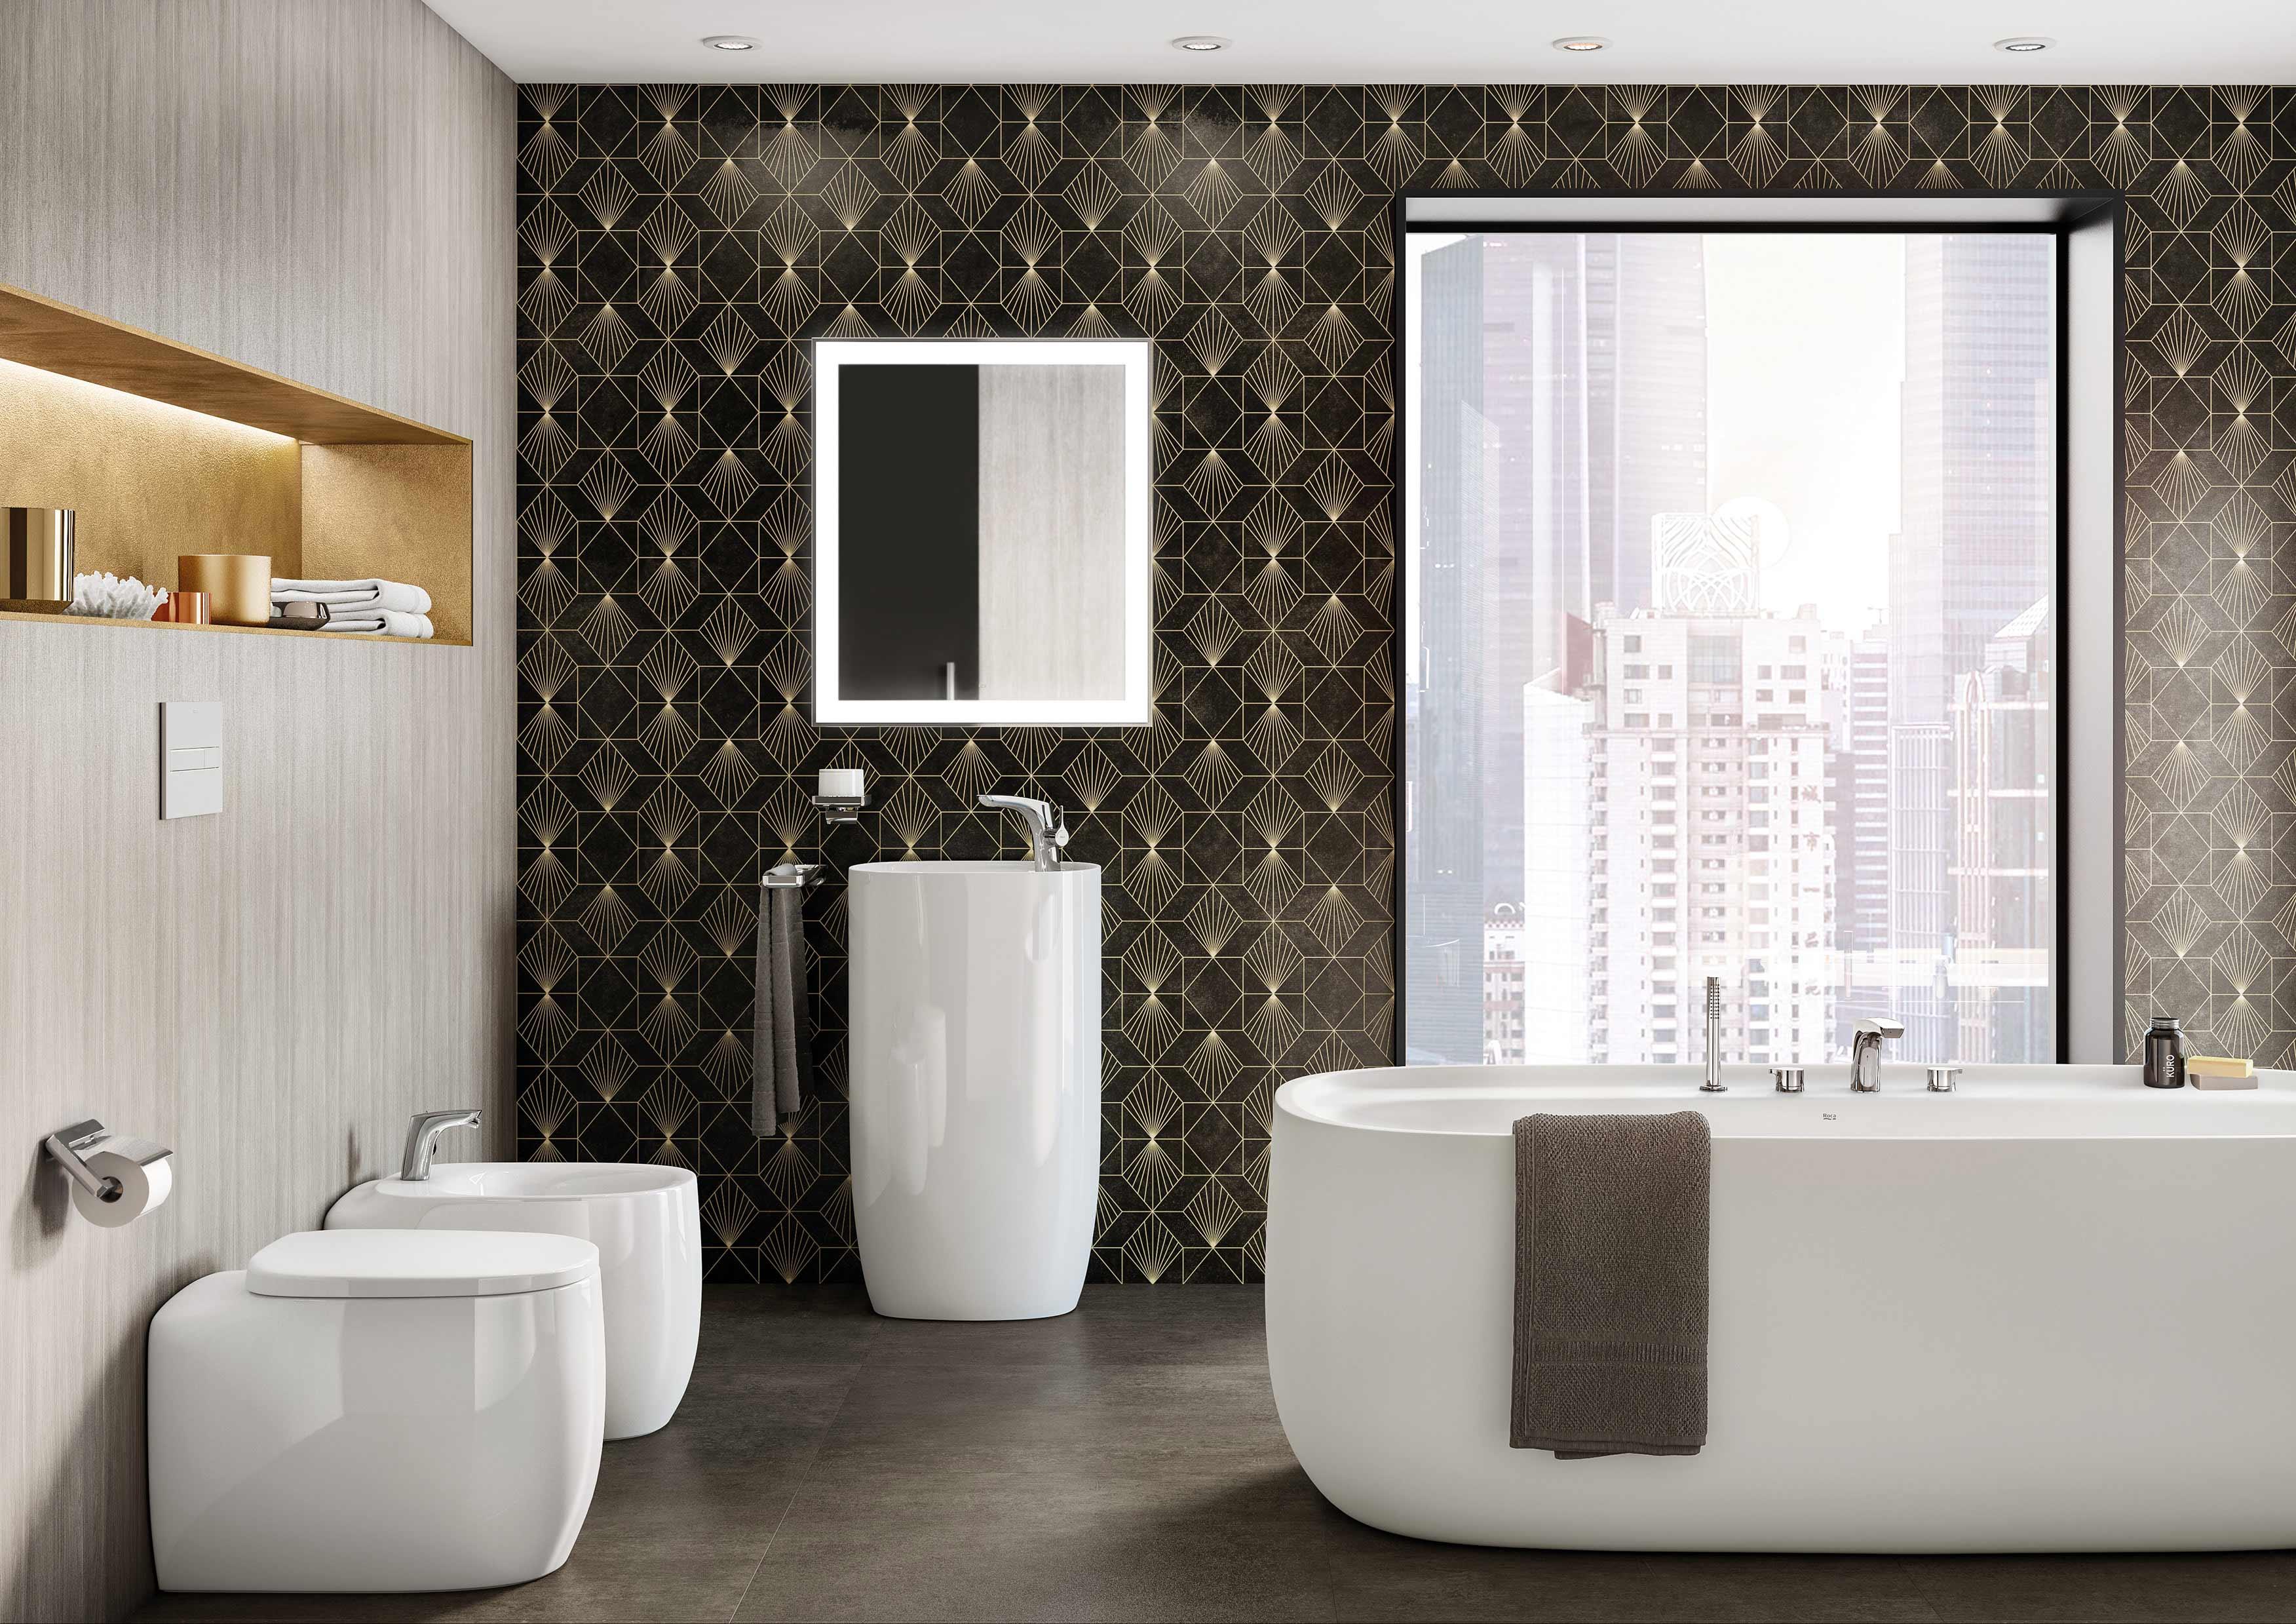 innovative luxury bathroom design ideas   Beyond - modern and innovative bathroom designs   Roca Life